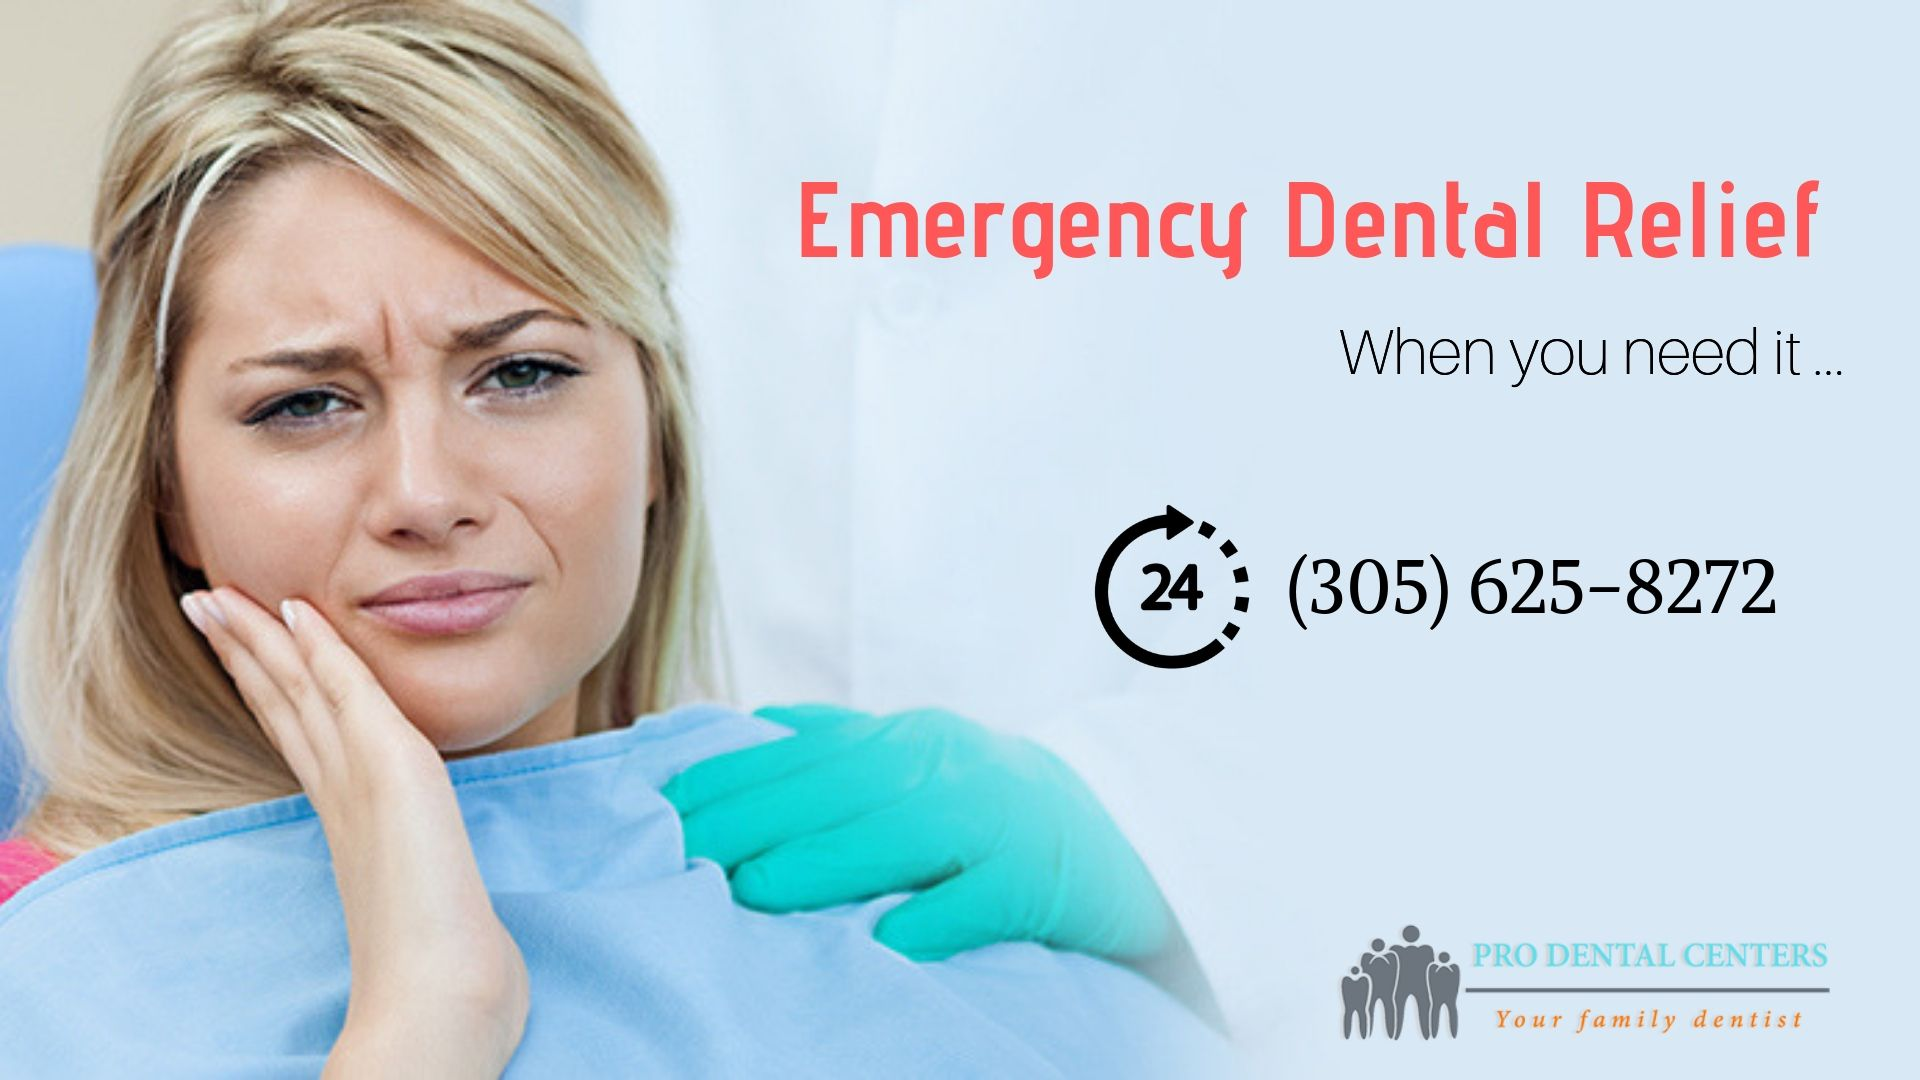 Emergency Dental Care Miami Emergency dental care